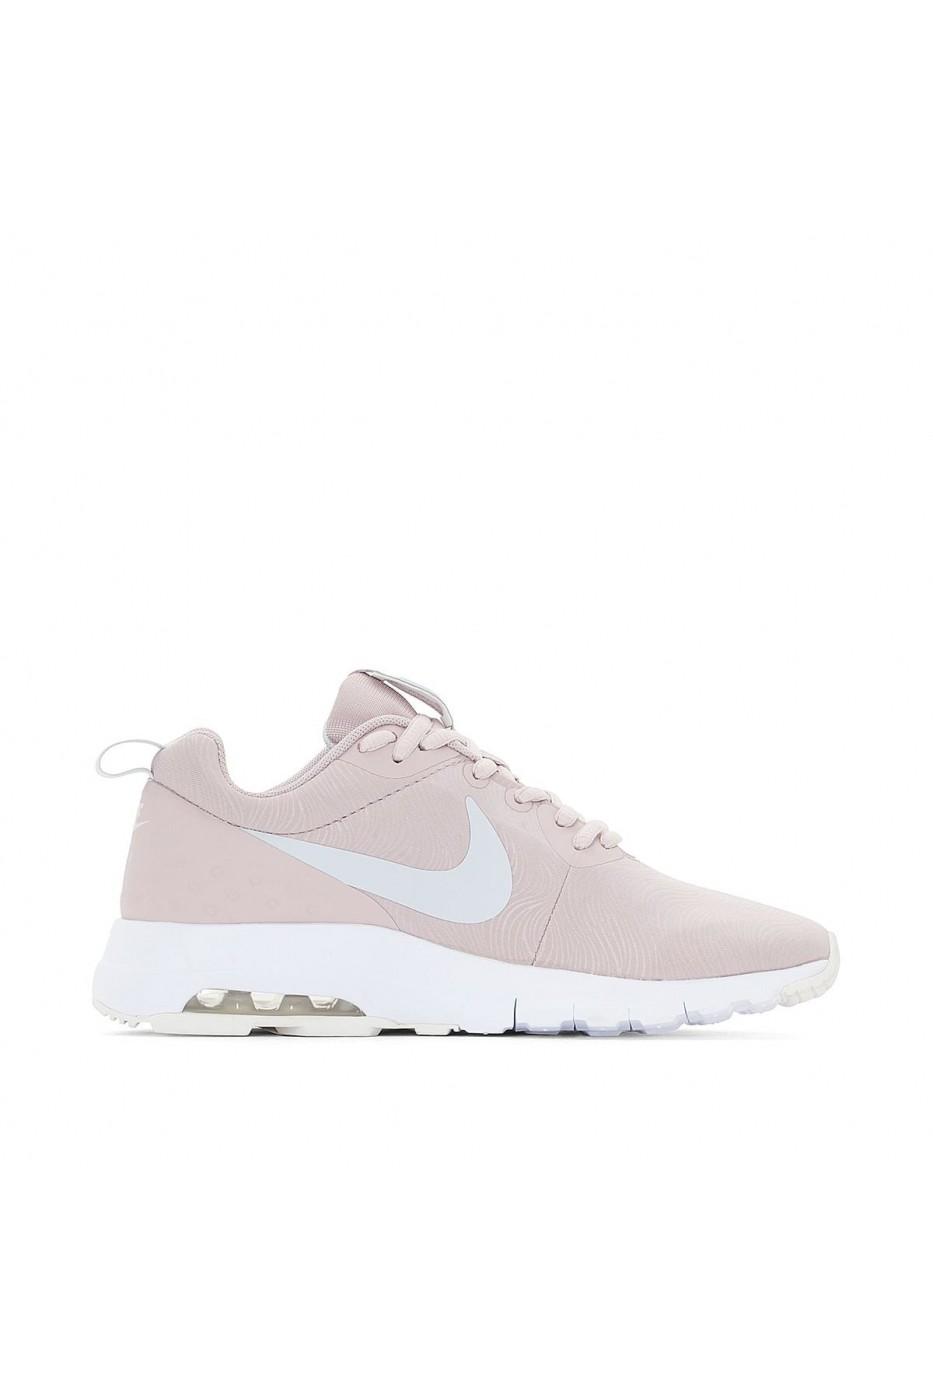 Gep474 Rózsaszín Sneaker Lrd Roz Nike Cipő Fashionup 0NwkXOPn8Z